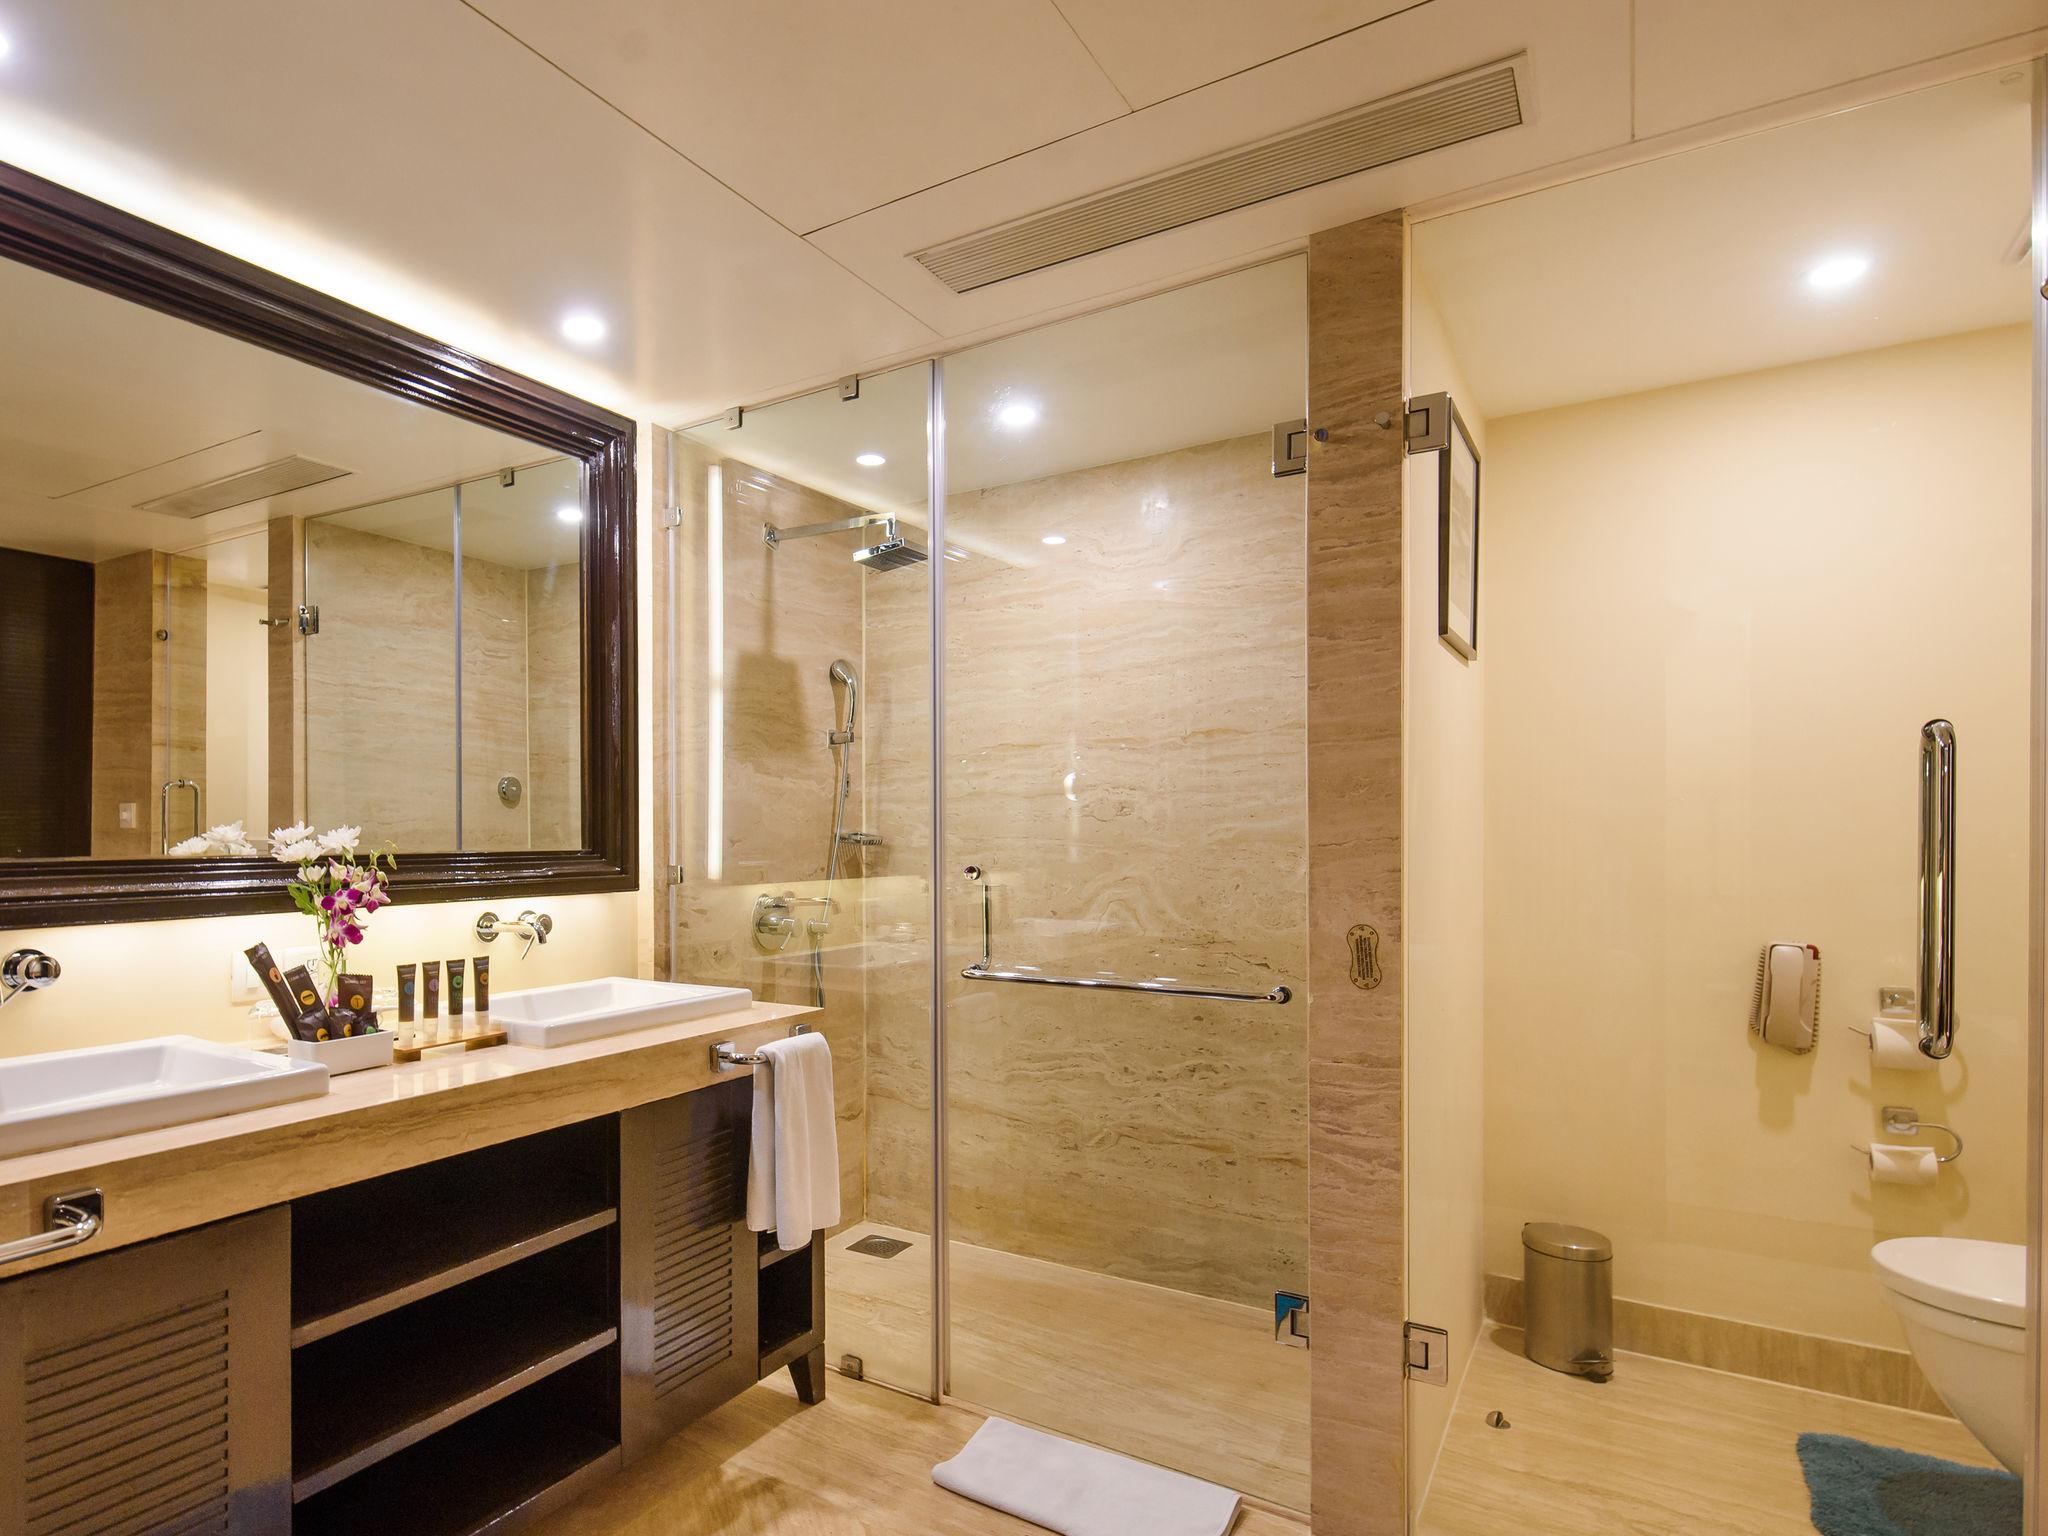 5-Star Shrem Resort-Novotel Goa Resorts & Spa on steam room bathrooms, swimming pool bathrooms, public pool bathrooms, outdoor pool bathrooms, beach bathrooms, gym bathrooms, spa bathrooms, golf bathrooms, restaurant bathrooms, gas station bathrooms, luxury pool bathrooms, hair salon bathrooms,